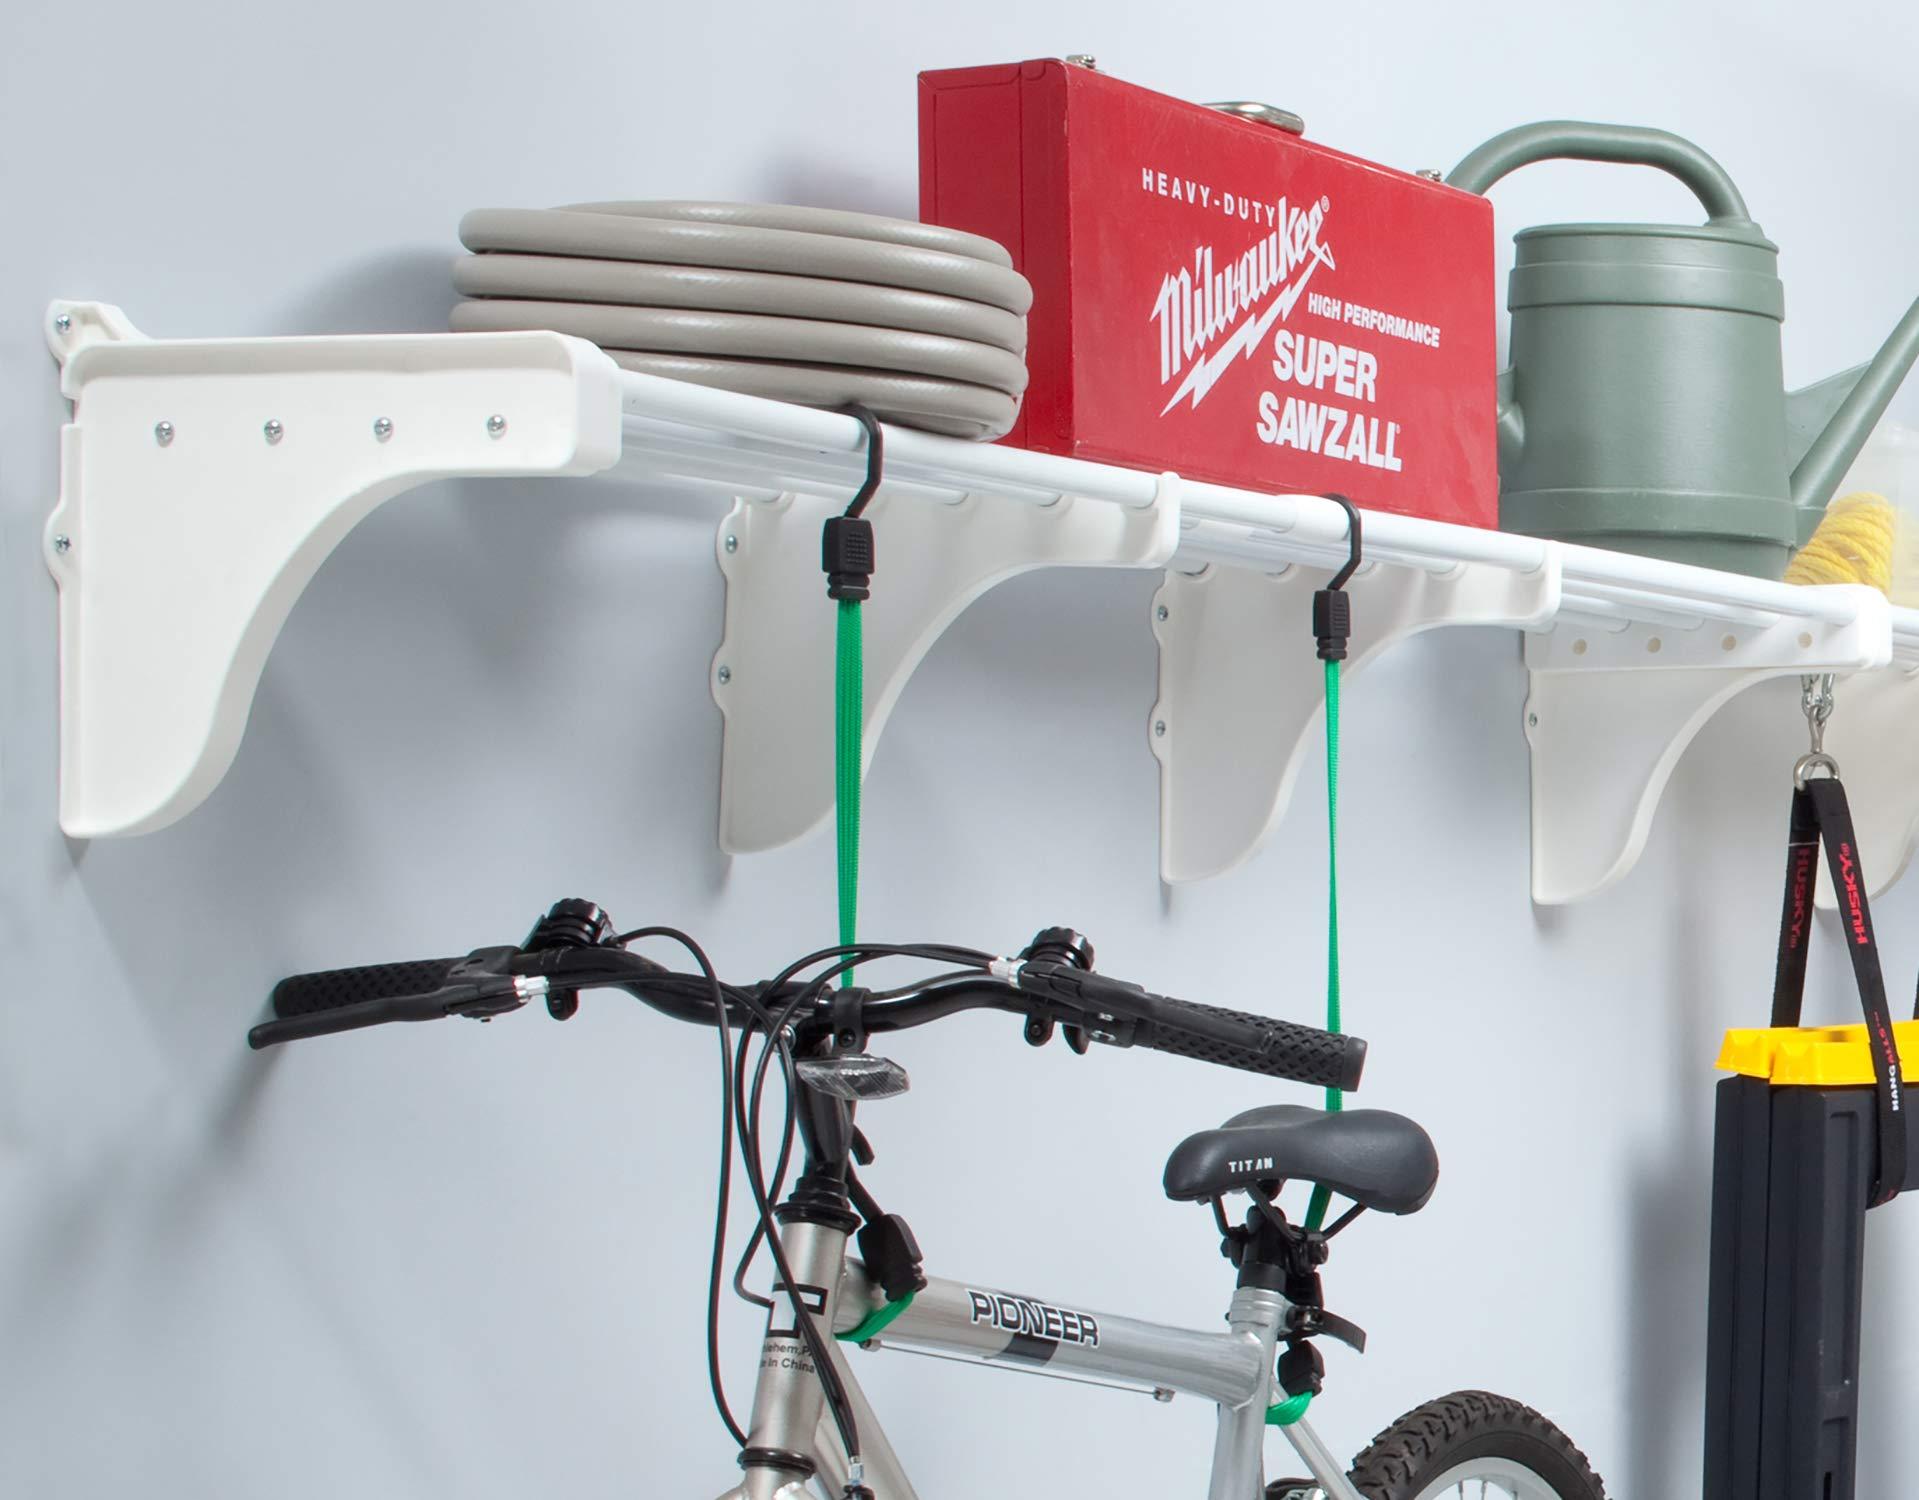 EZ Shelf - Expandable Garage Shelf, Up to 6.3 ft. of Storage Space, White